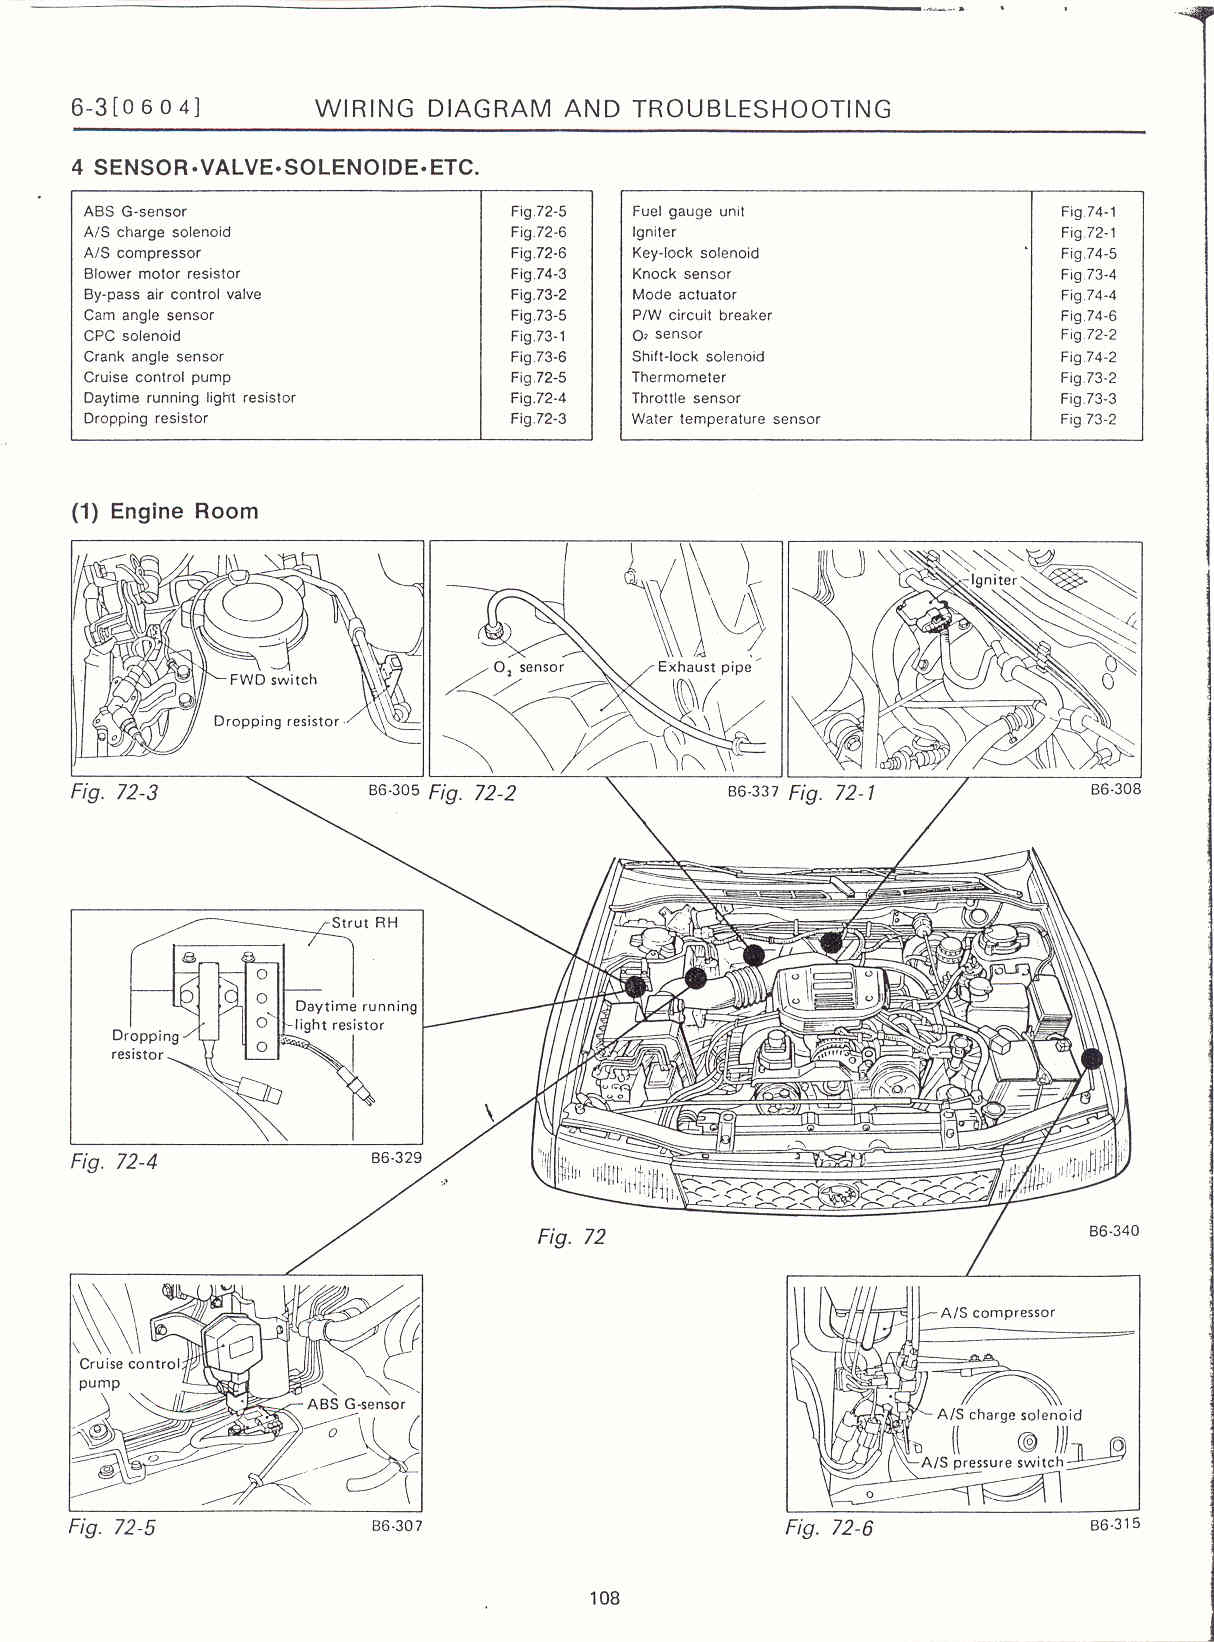 1990 Subaru Loyale Wiring Diagram Wiring Diagram